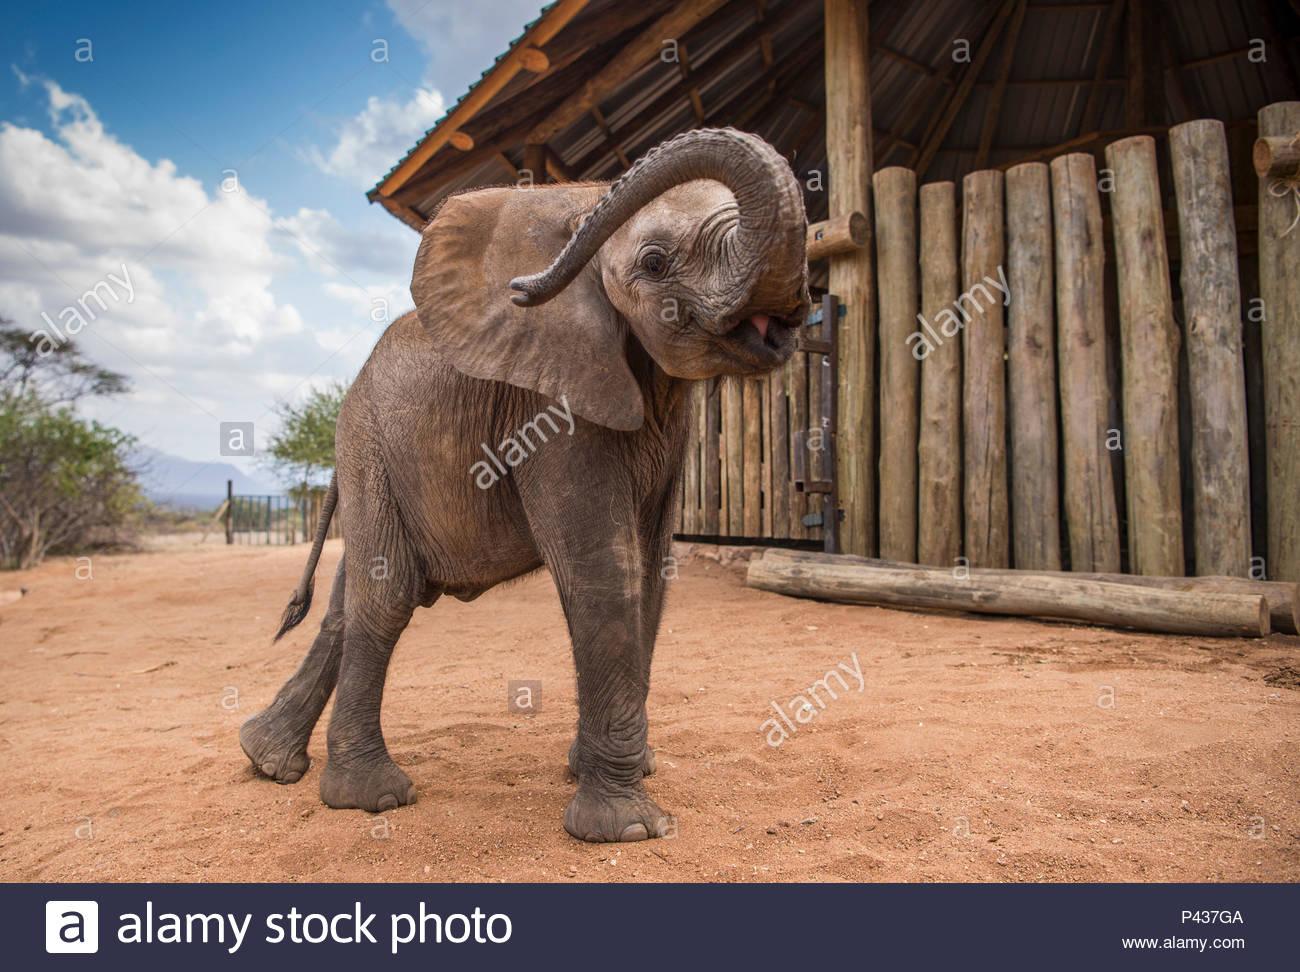 An orphan elephant at the Reteti Elephant Sanctuary in northern Kenya. - Stock Image